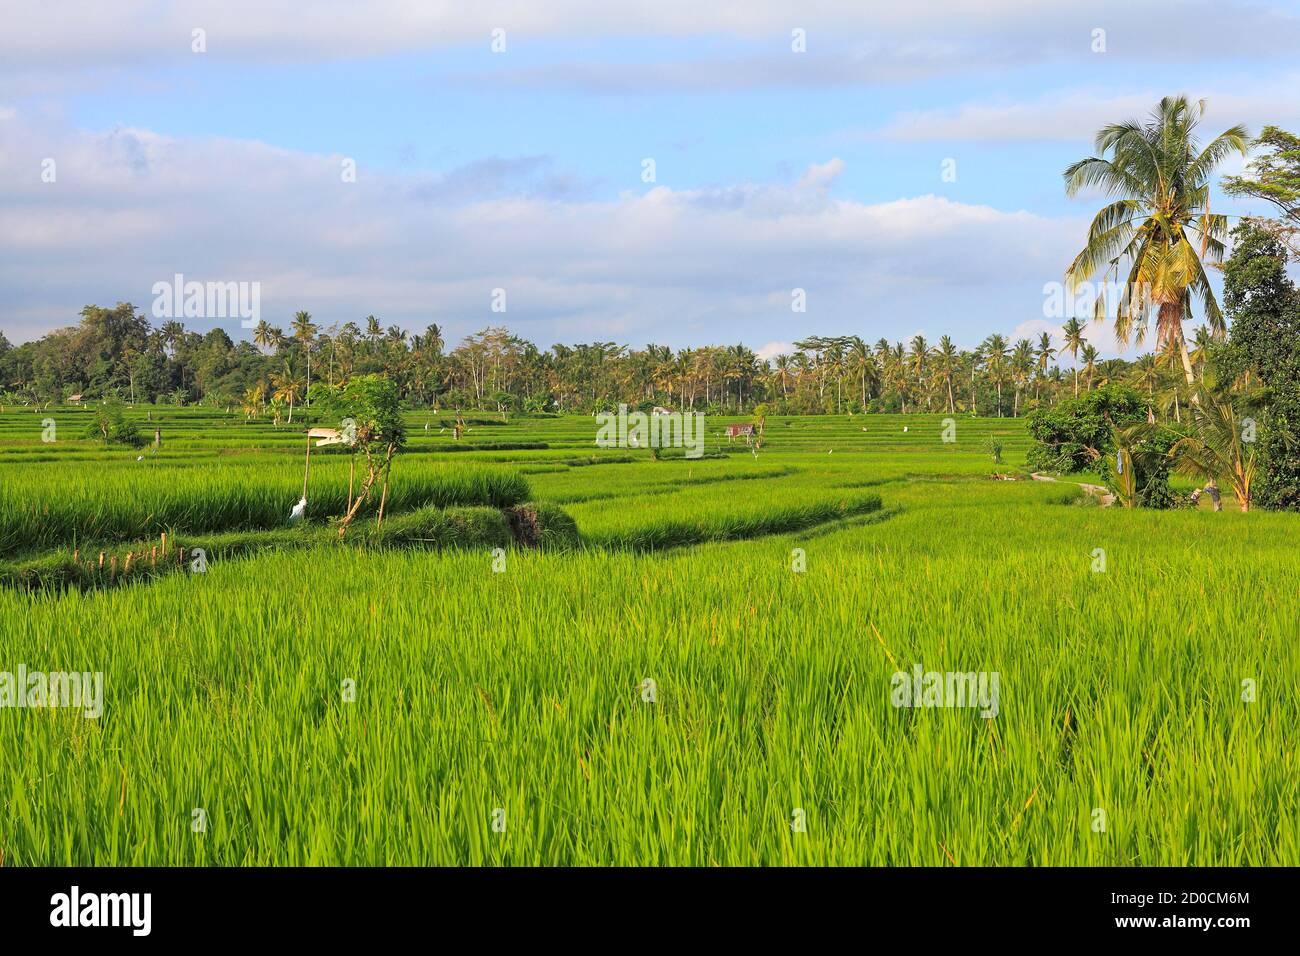 green-terraced-rice-paddies-pejeng-near-ubud-bali-indonesia-2D0CM6M.jpg